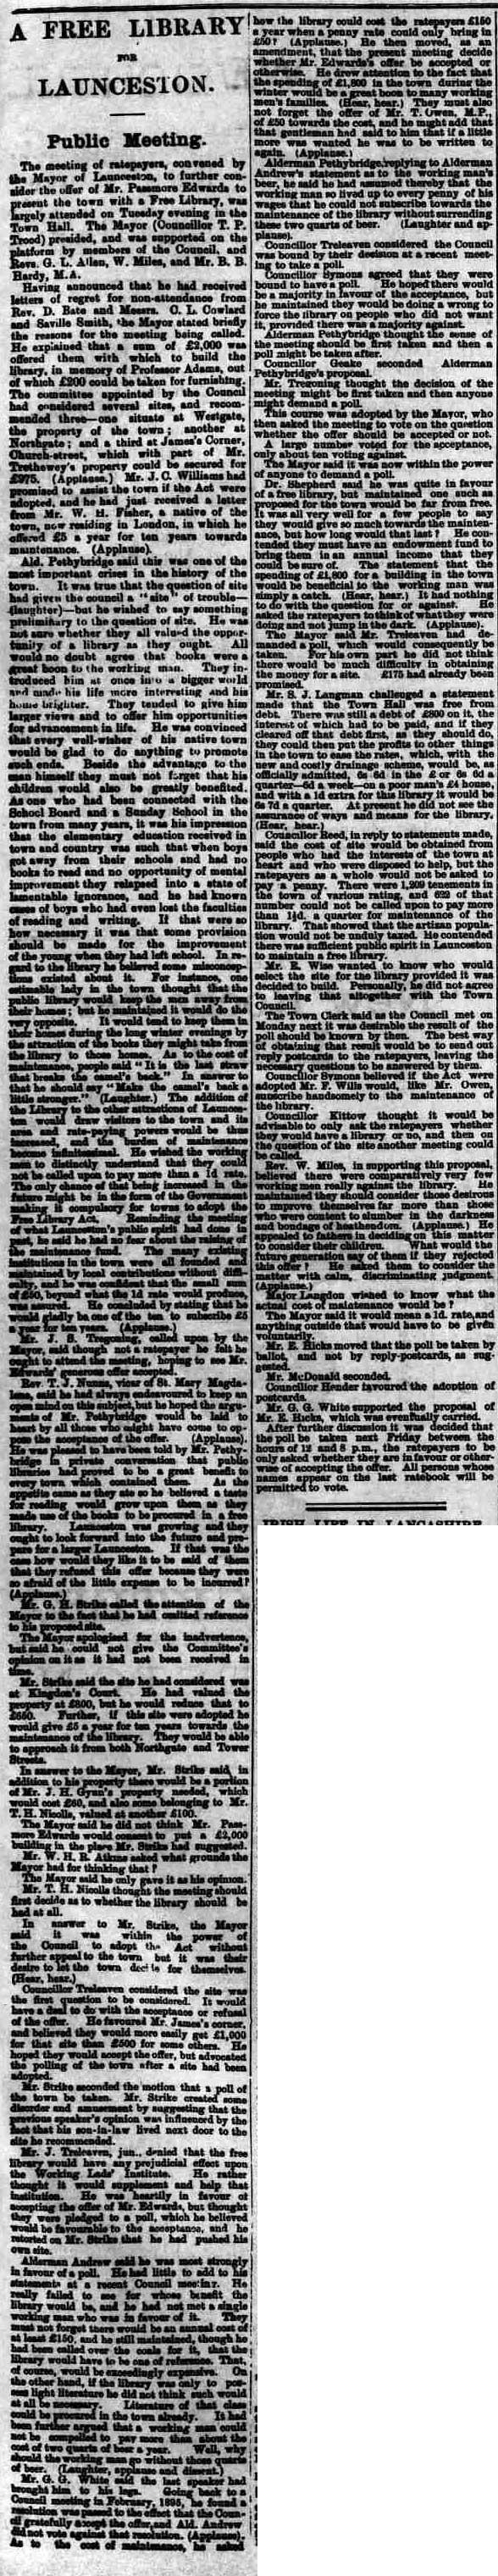 12 December 1896